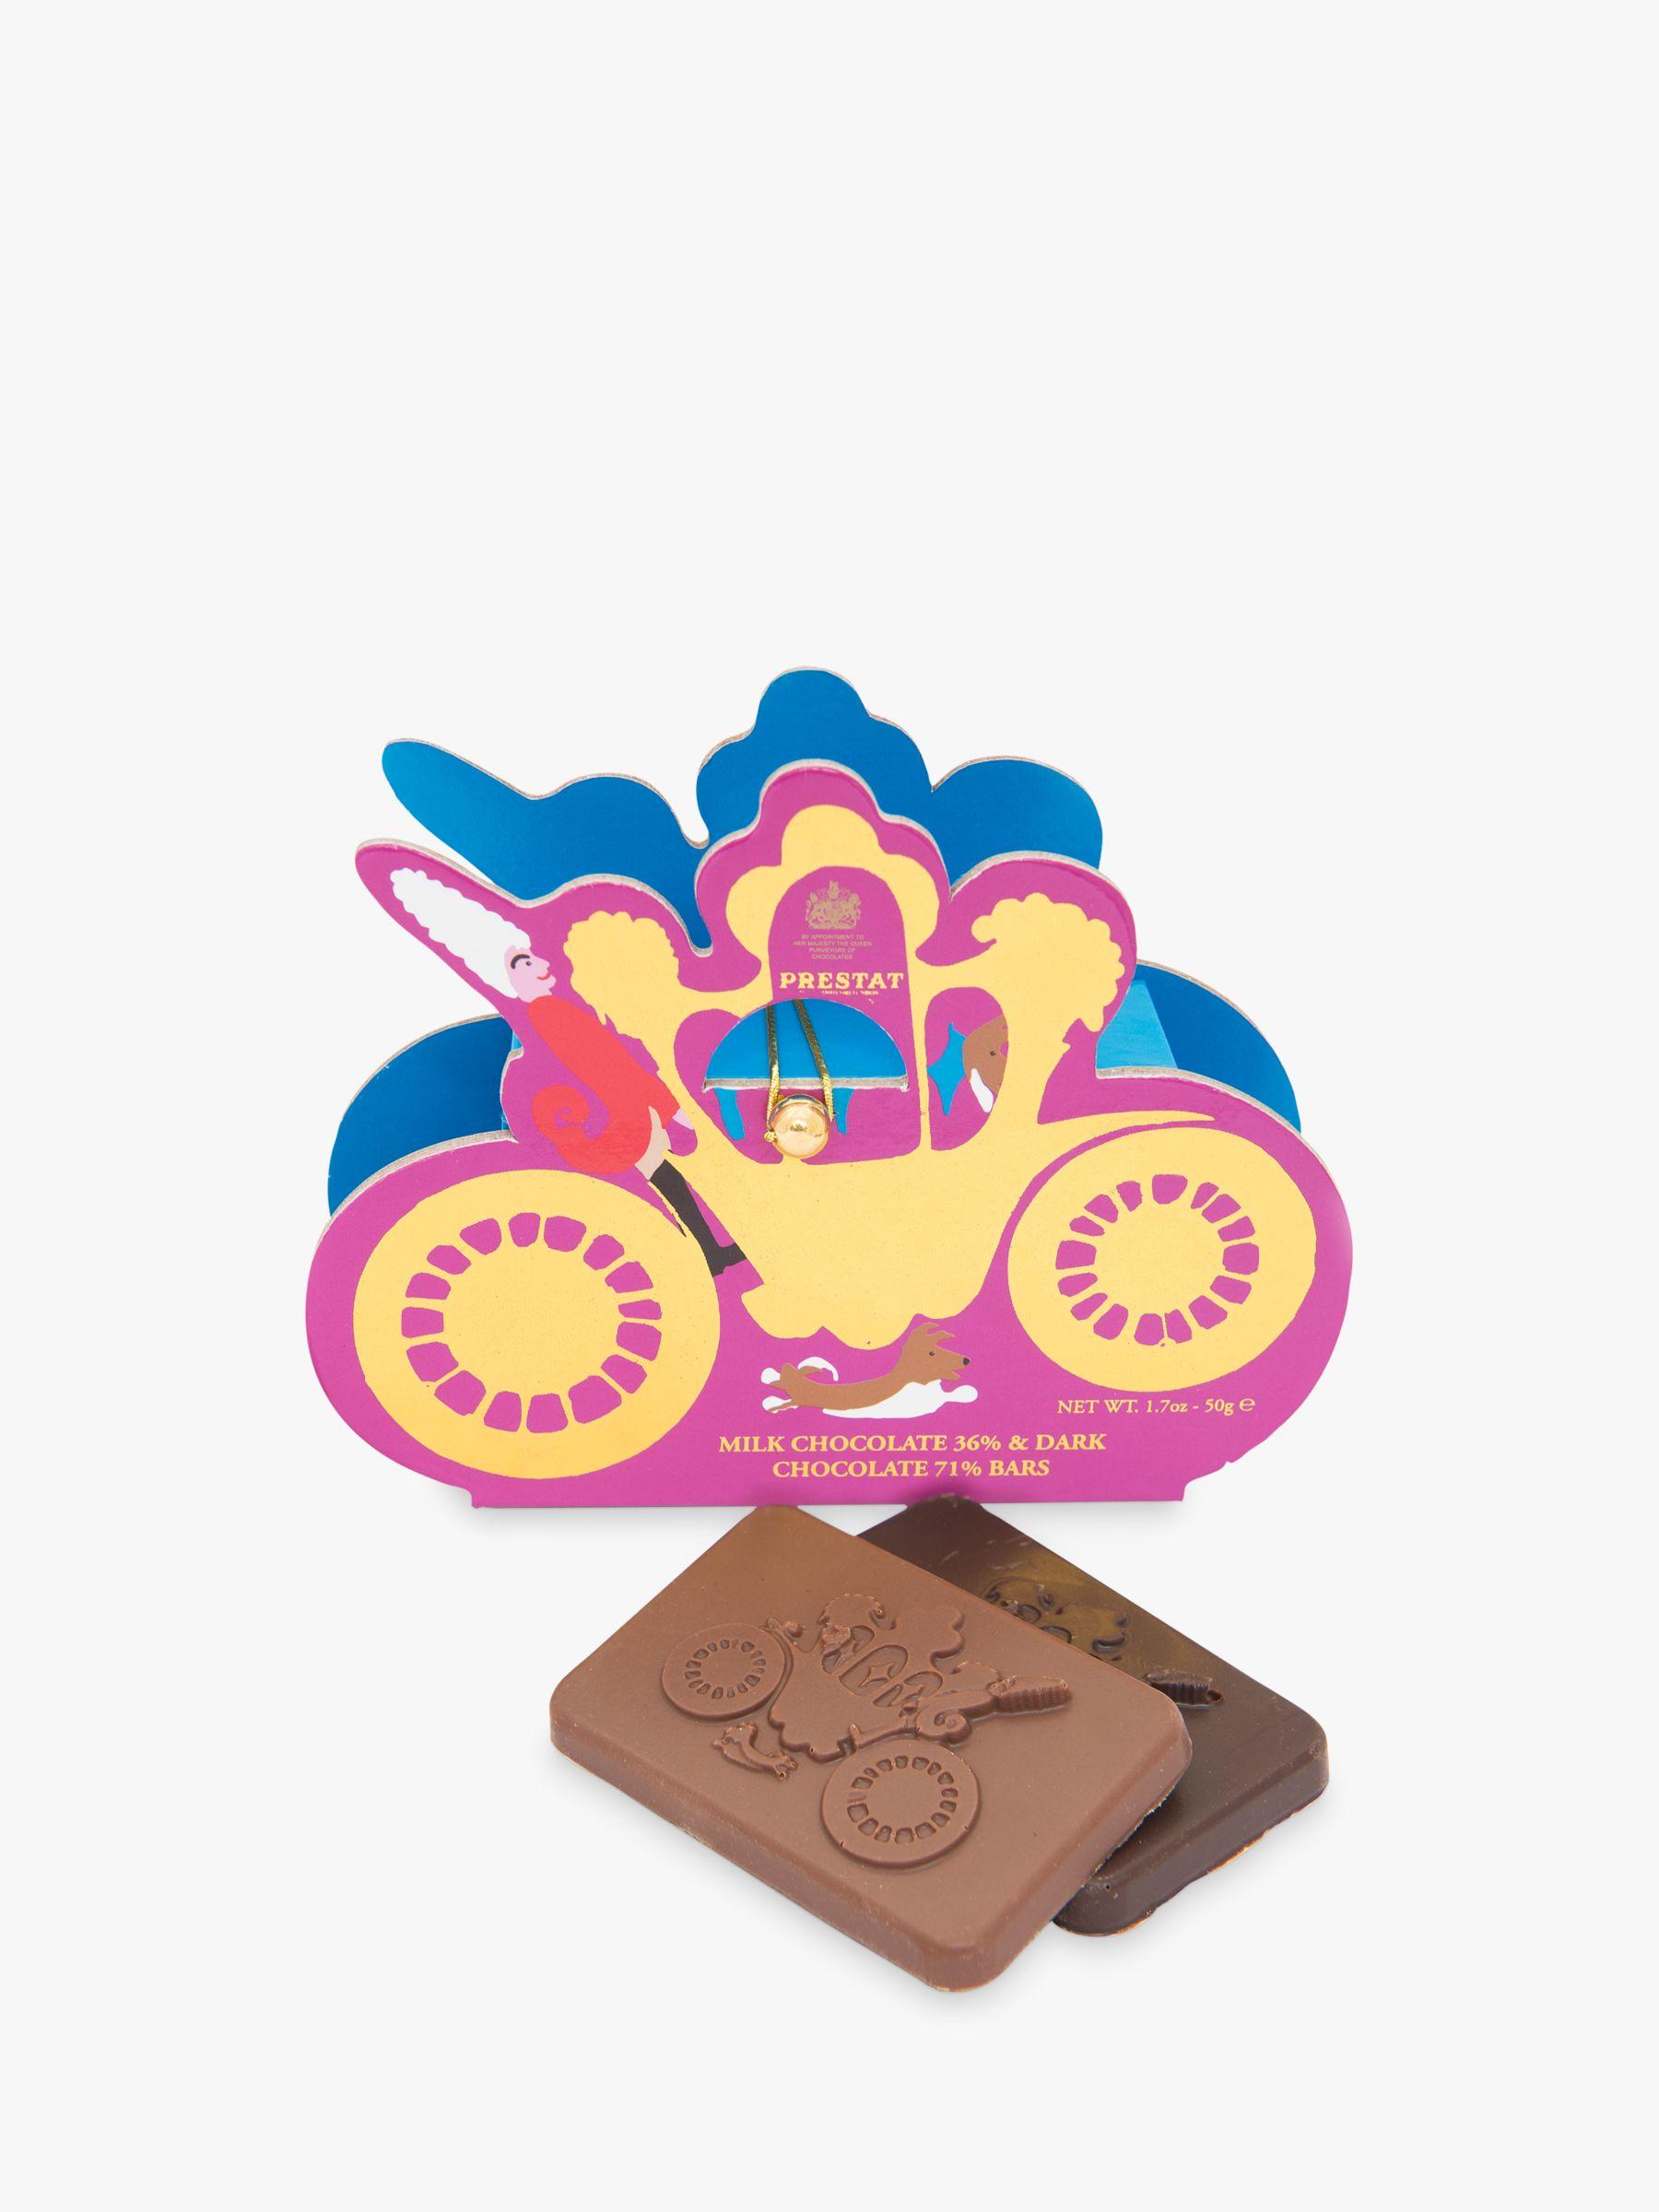 Prestat Prestat Carriage Milk & Dark Chocolate Box